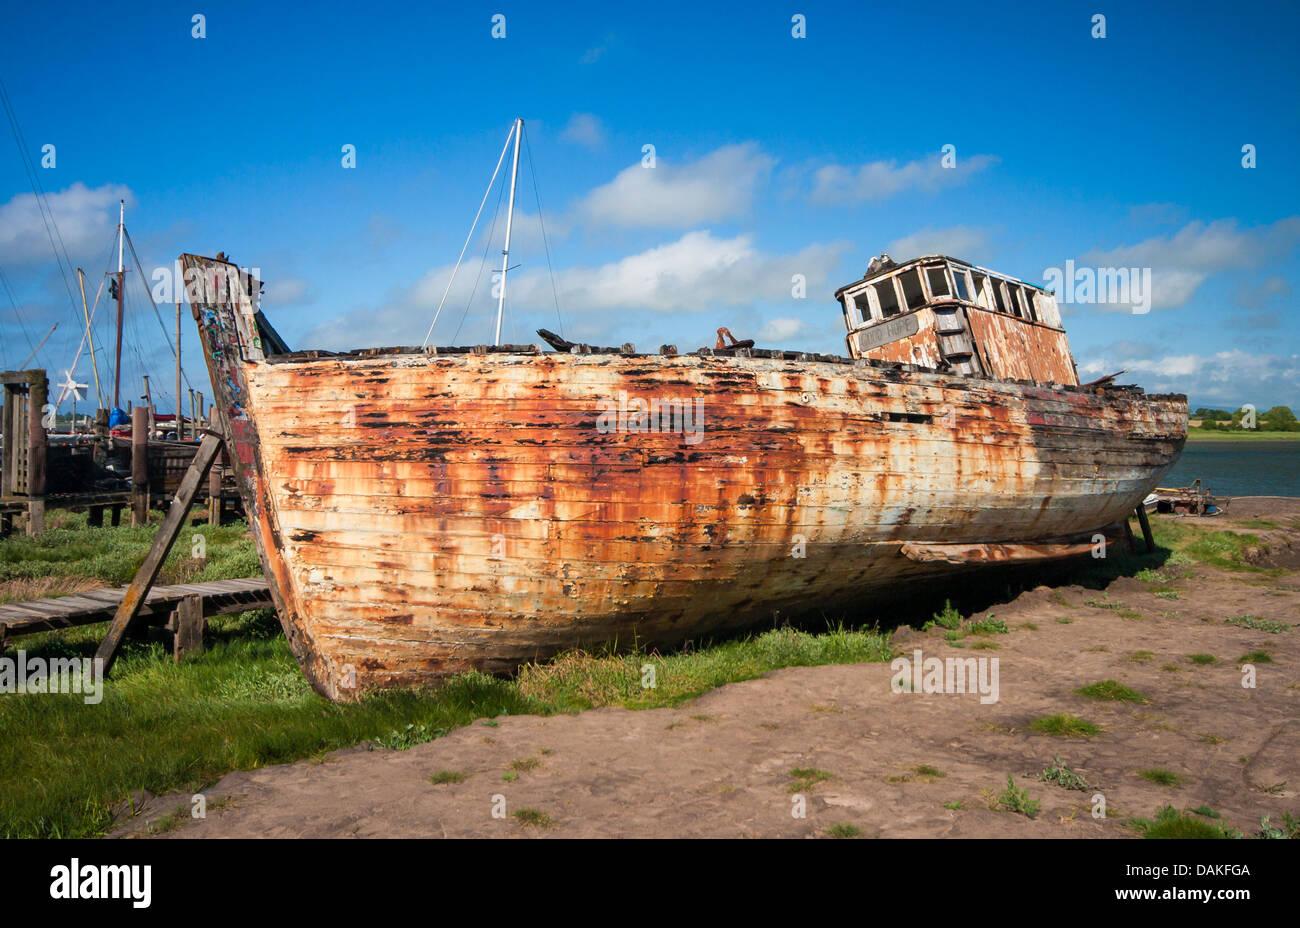 Abandoned fishing trawler (Good Hope) left to rot in Skippool Creek, Lancashire. - Stock Image